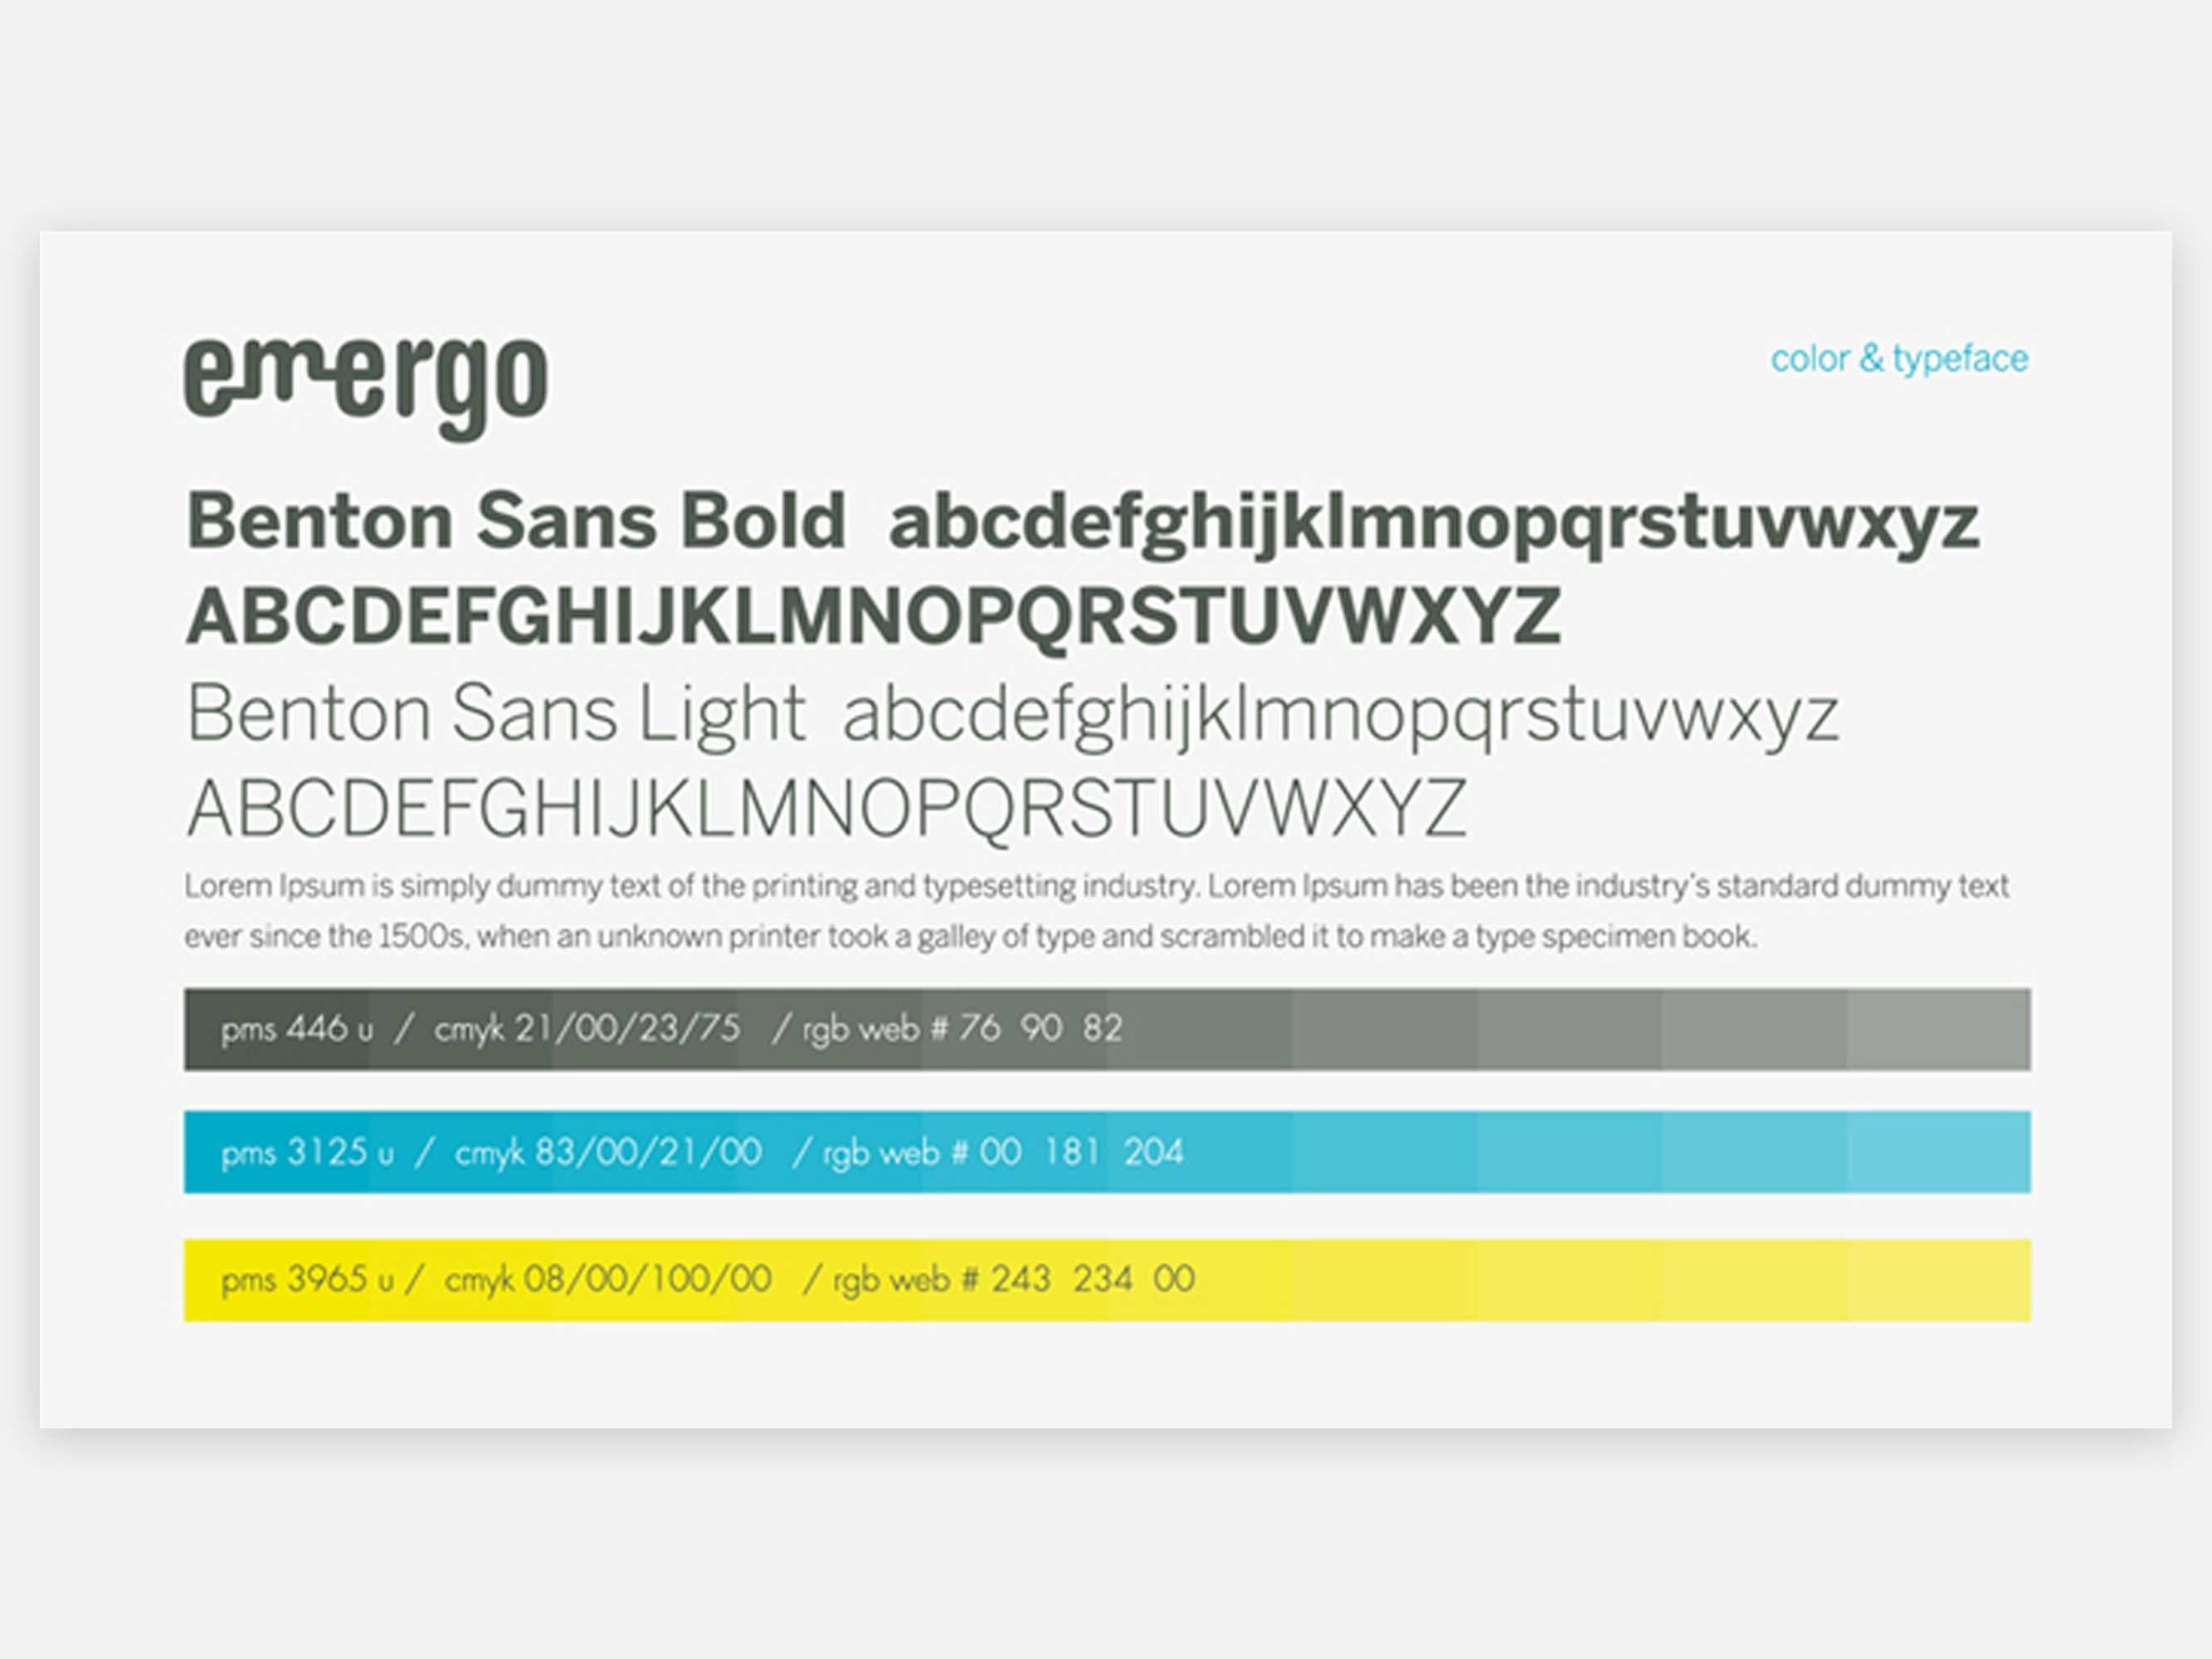 e-mergo kleur en typografie